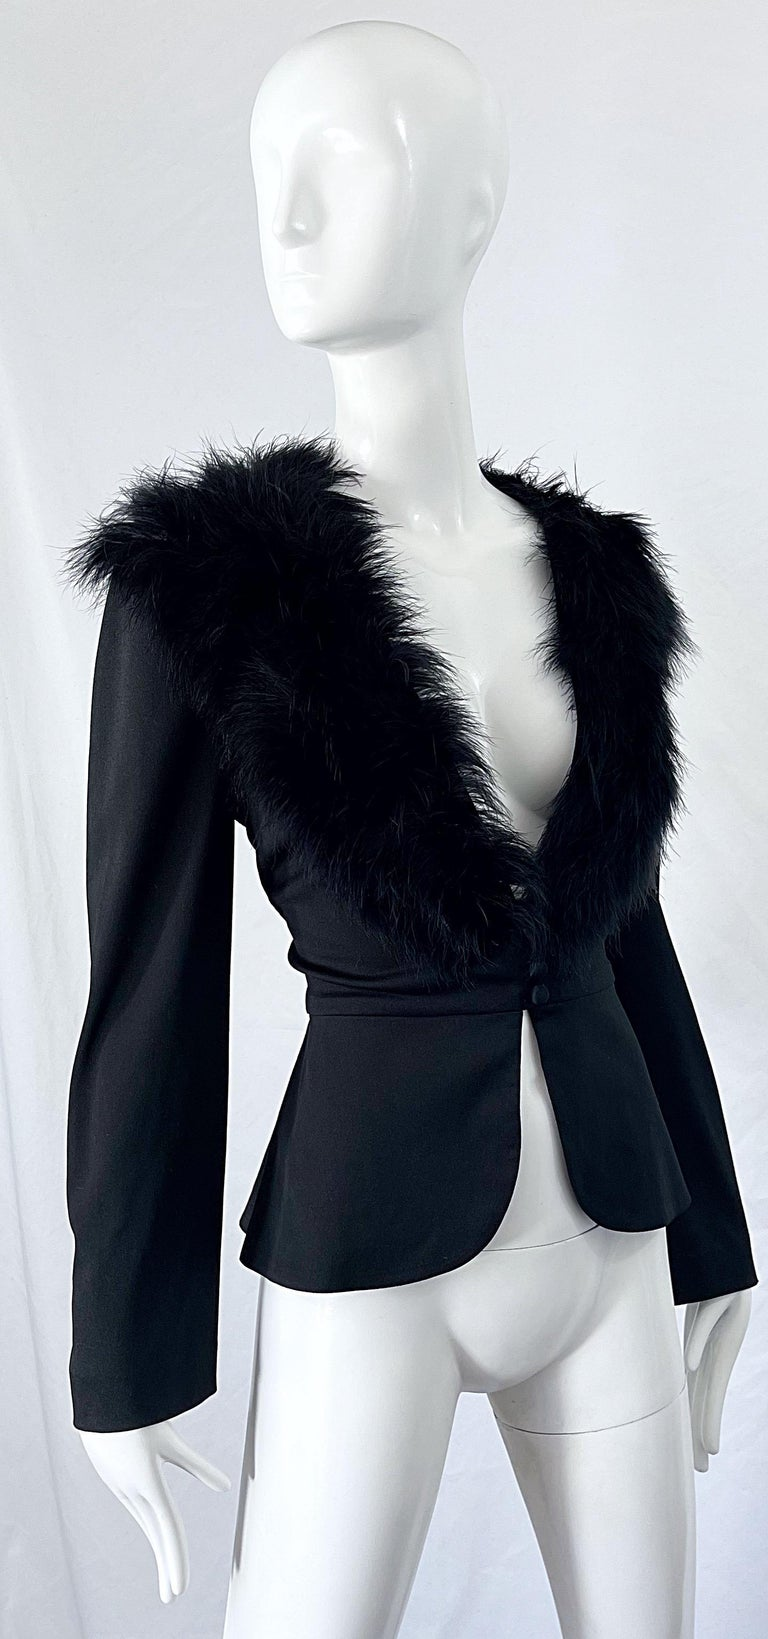 1970s Lilli Diamond Black Marabou Feathers Jersey Long Sleeve Vintage Cardigan  For Sale 7